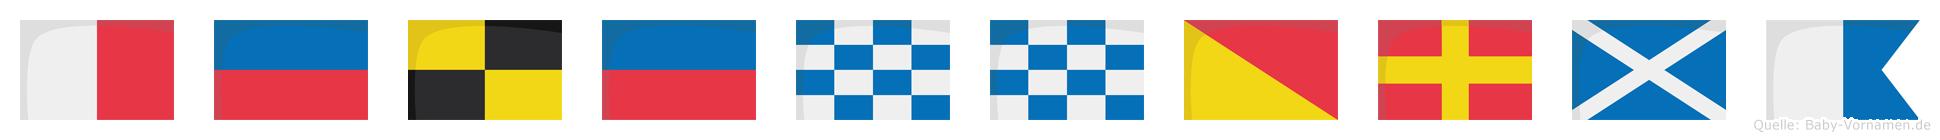 Helennorma im Flaggenalphabet